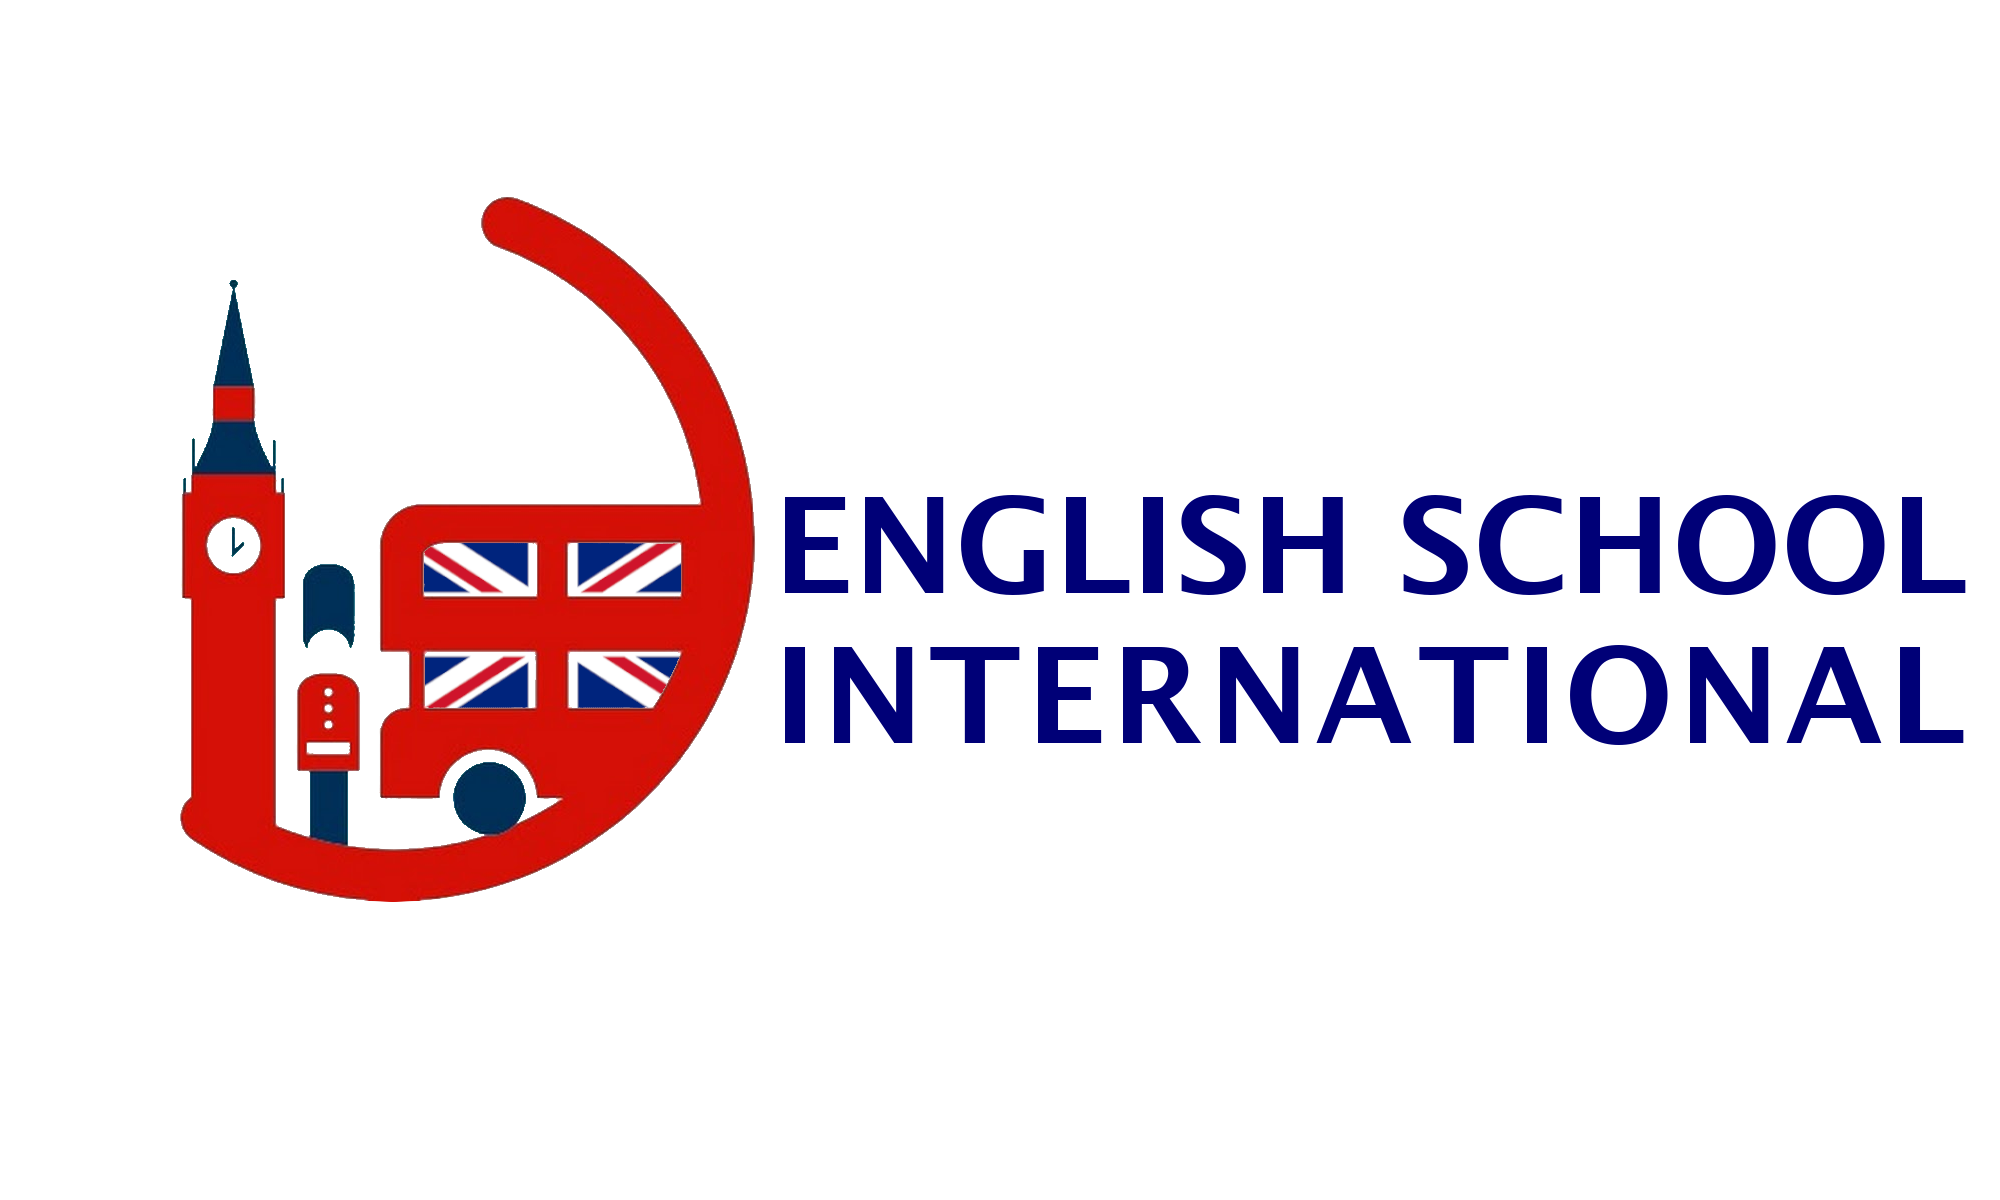 English School International